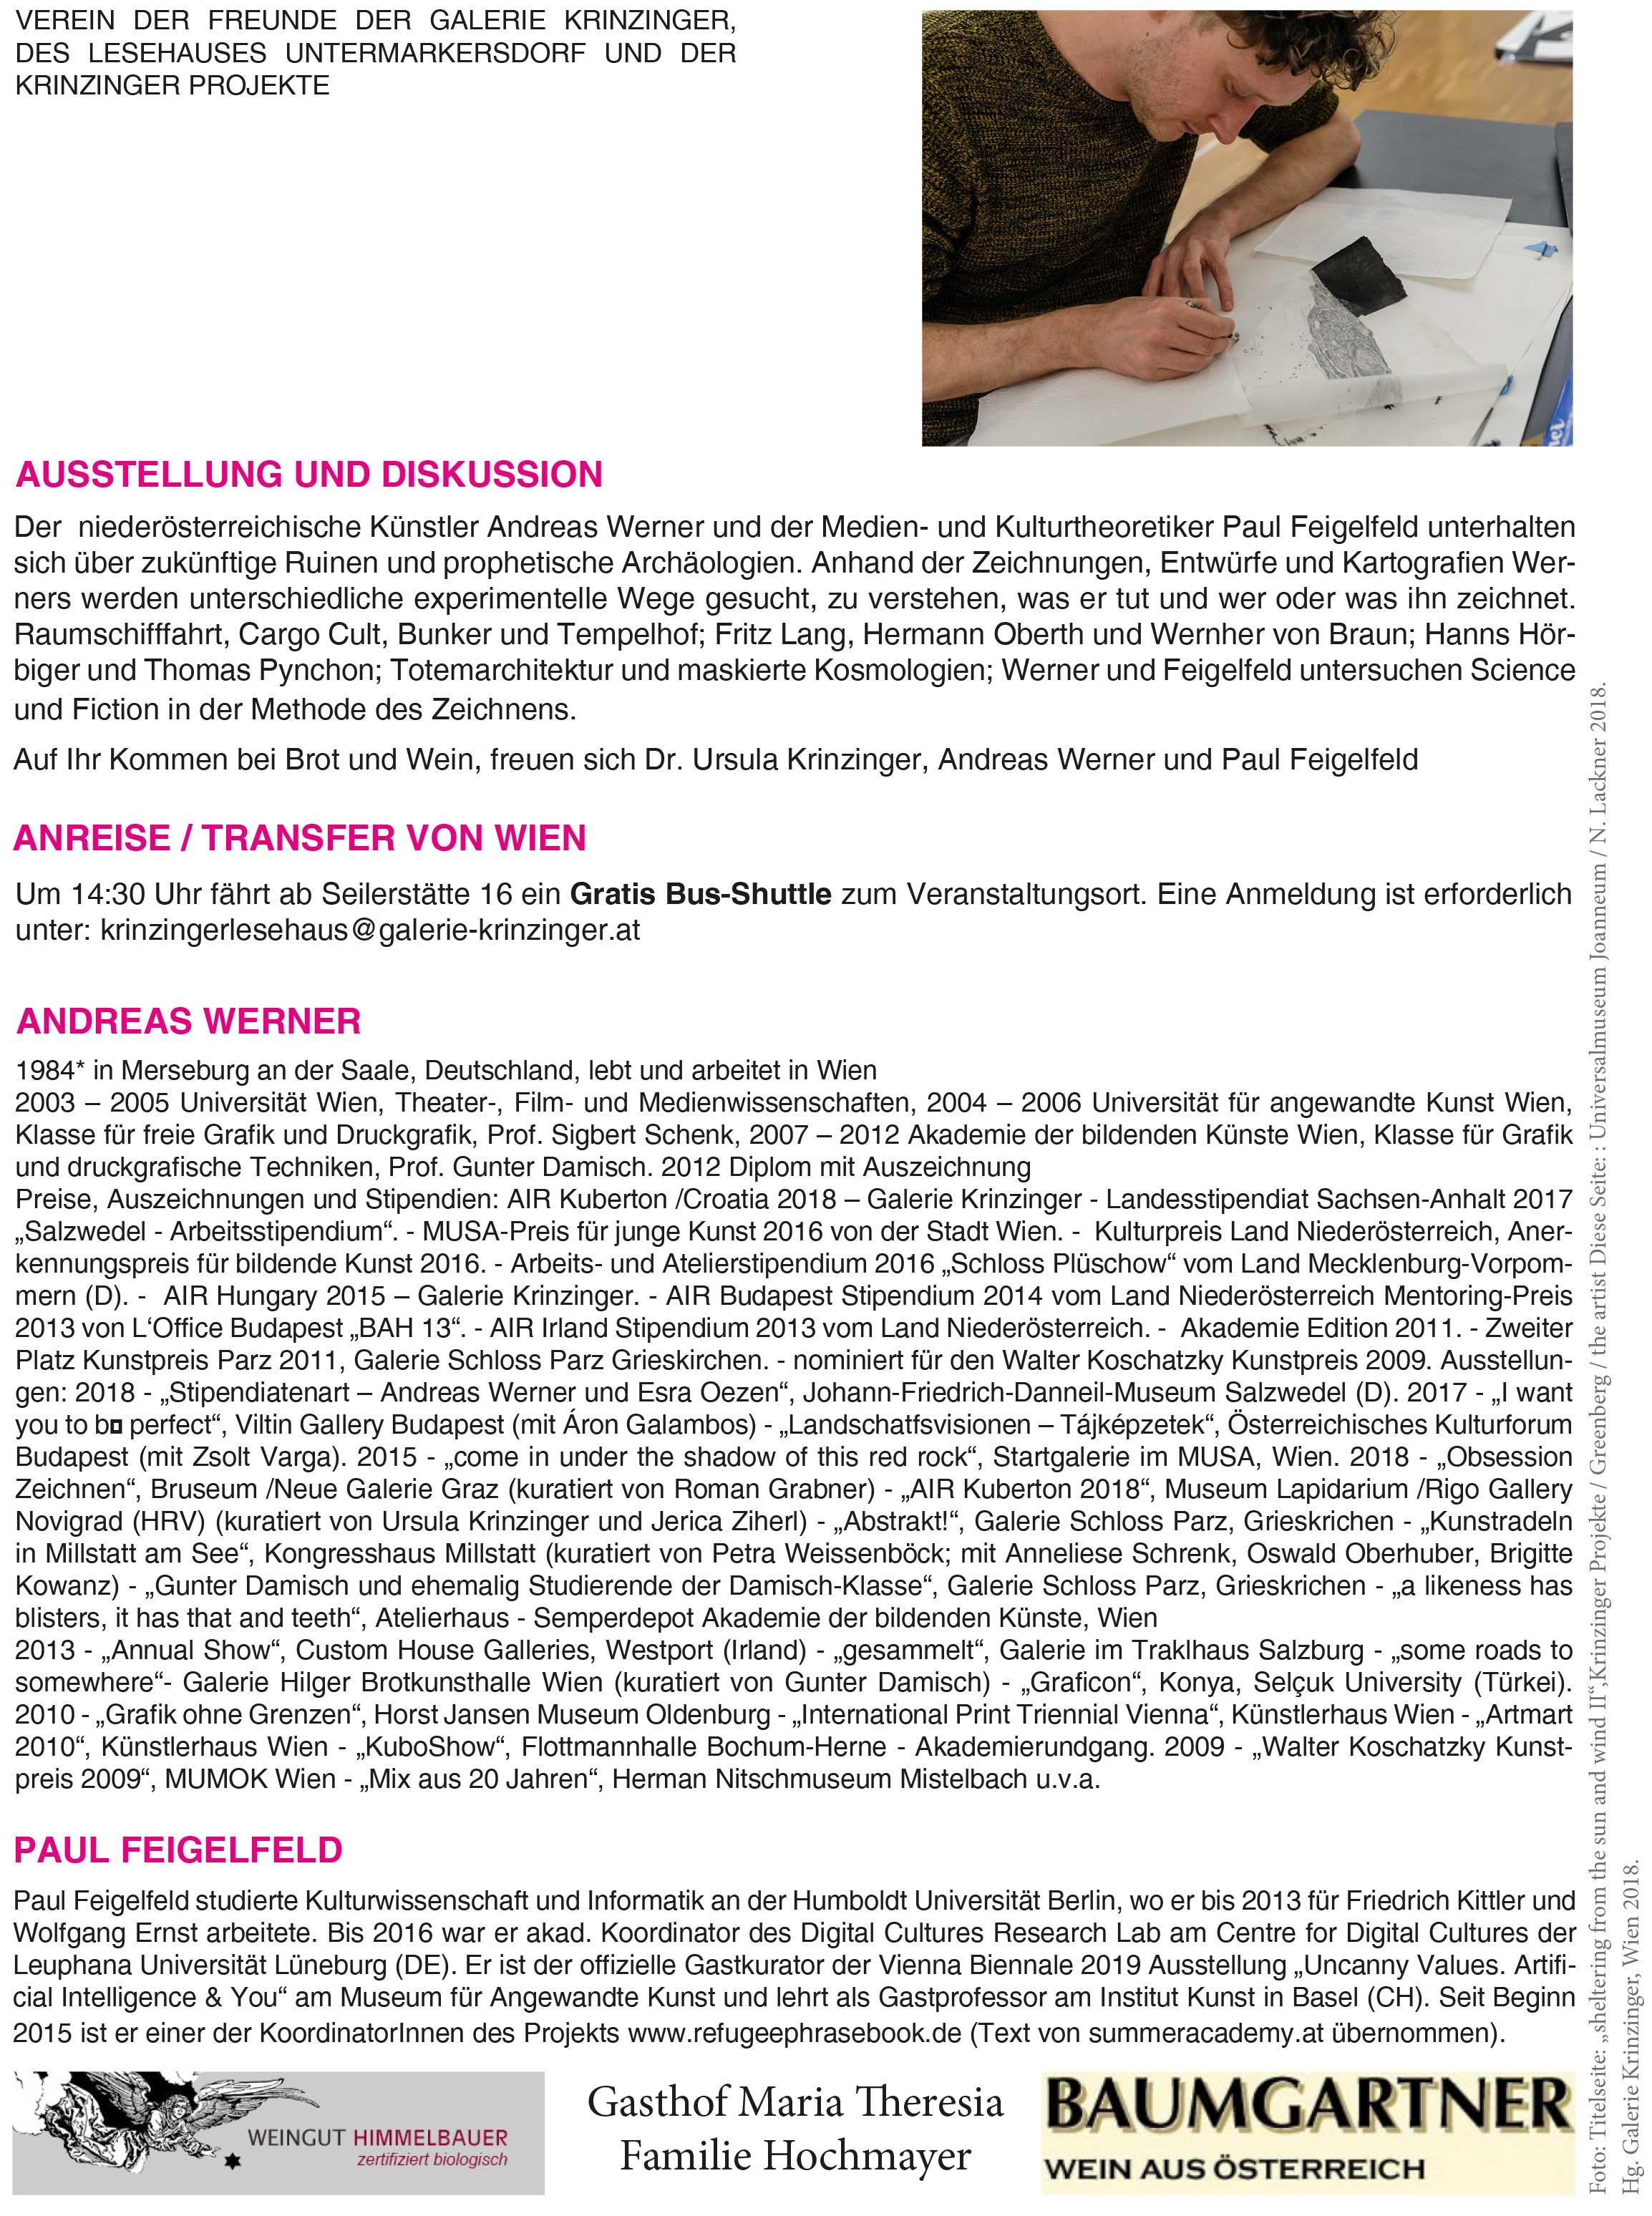 Andreas-Werner-Flyer-Krinzinger-Lesehaus-Dezember-2018---2